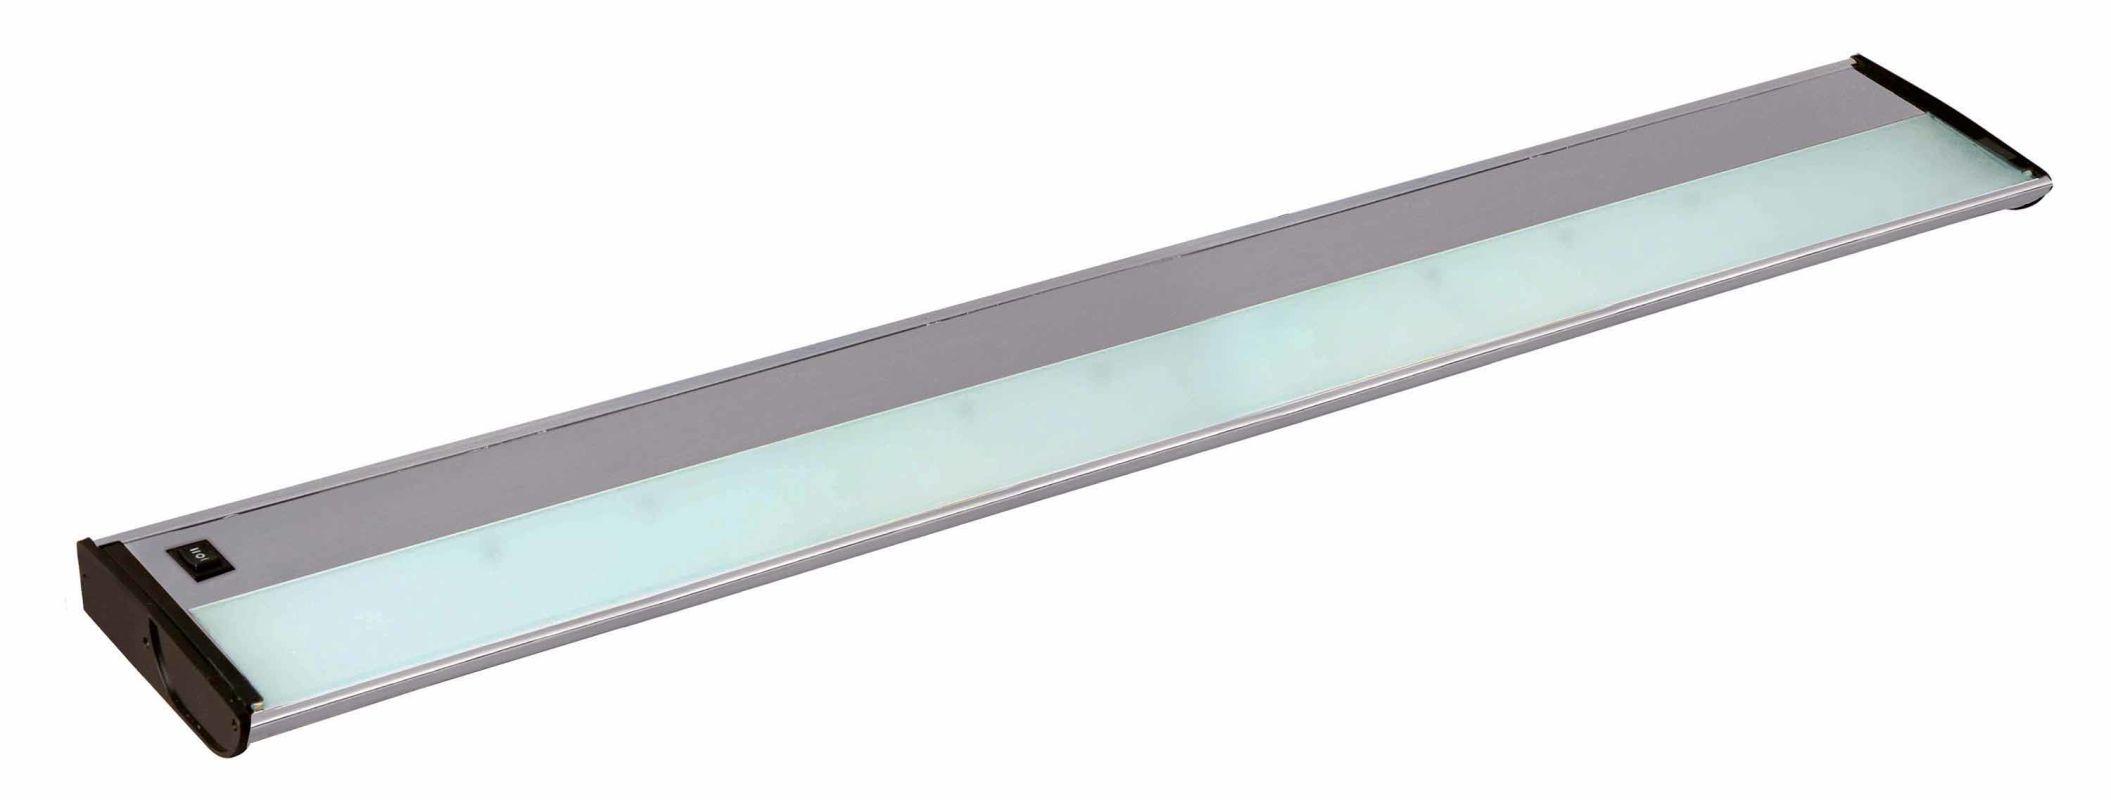 "Maxim 87833 30"" 4 Light Xenon Under Cabinet Light from the CounterMax"